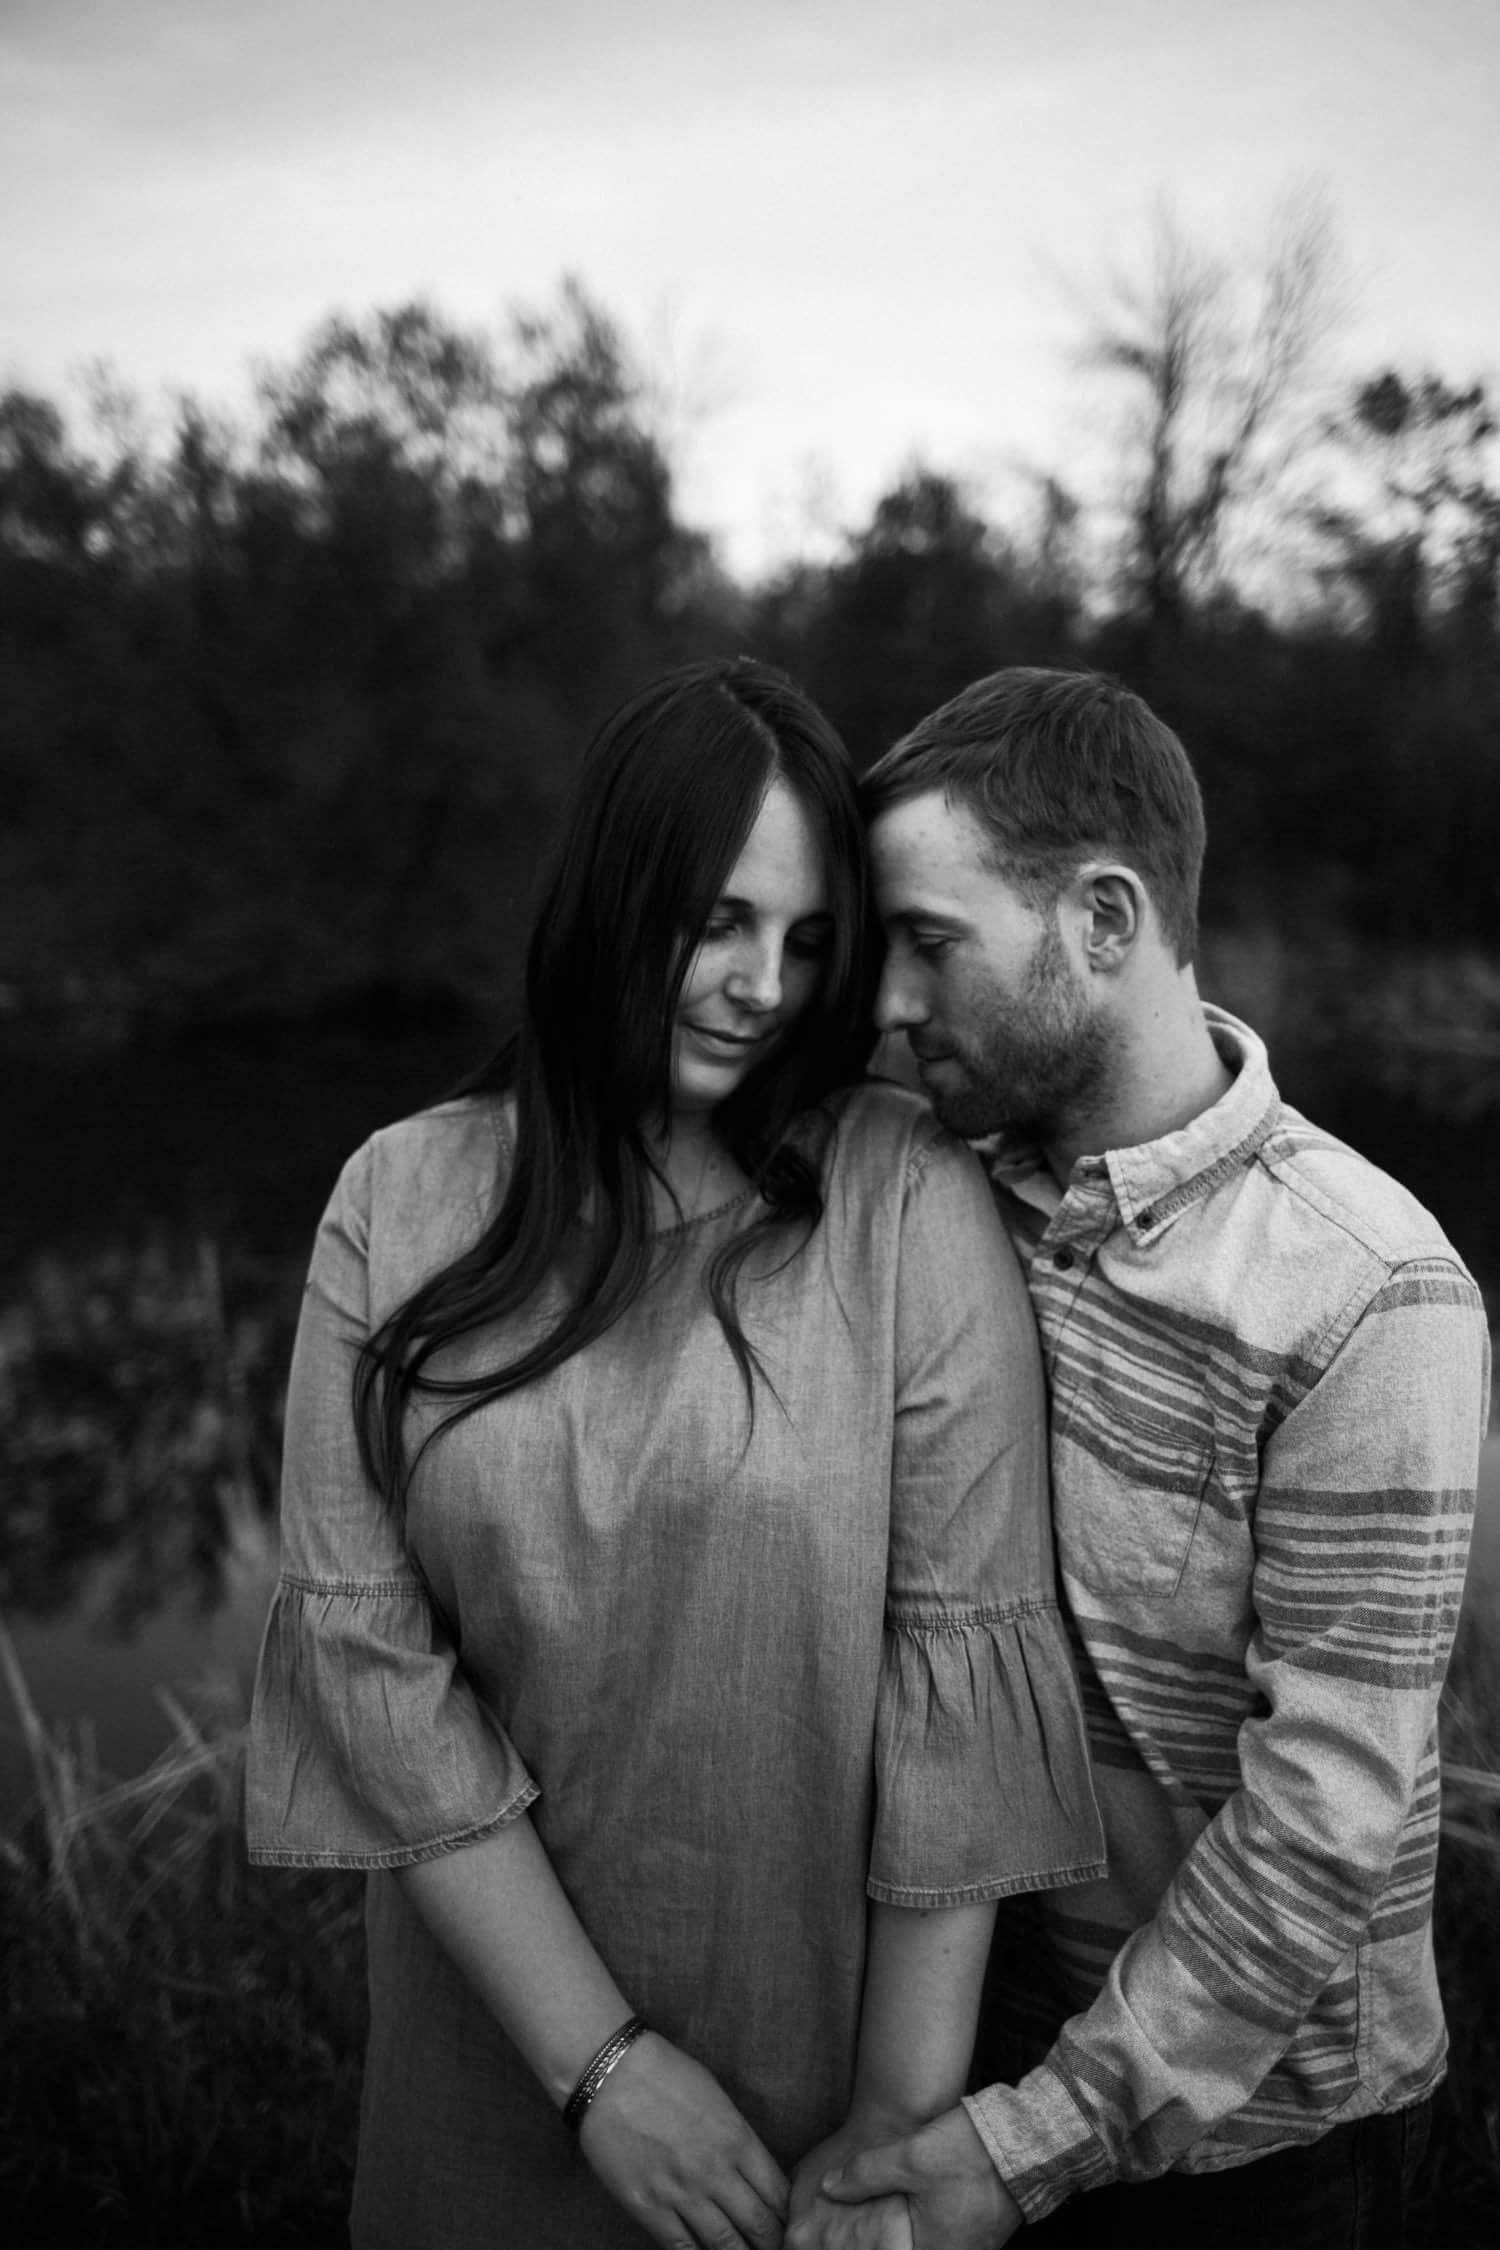 black and white engagement portrait - ottawa wedding photographer - carley teresa photography